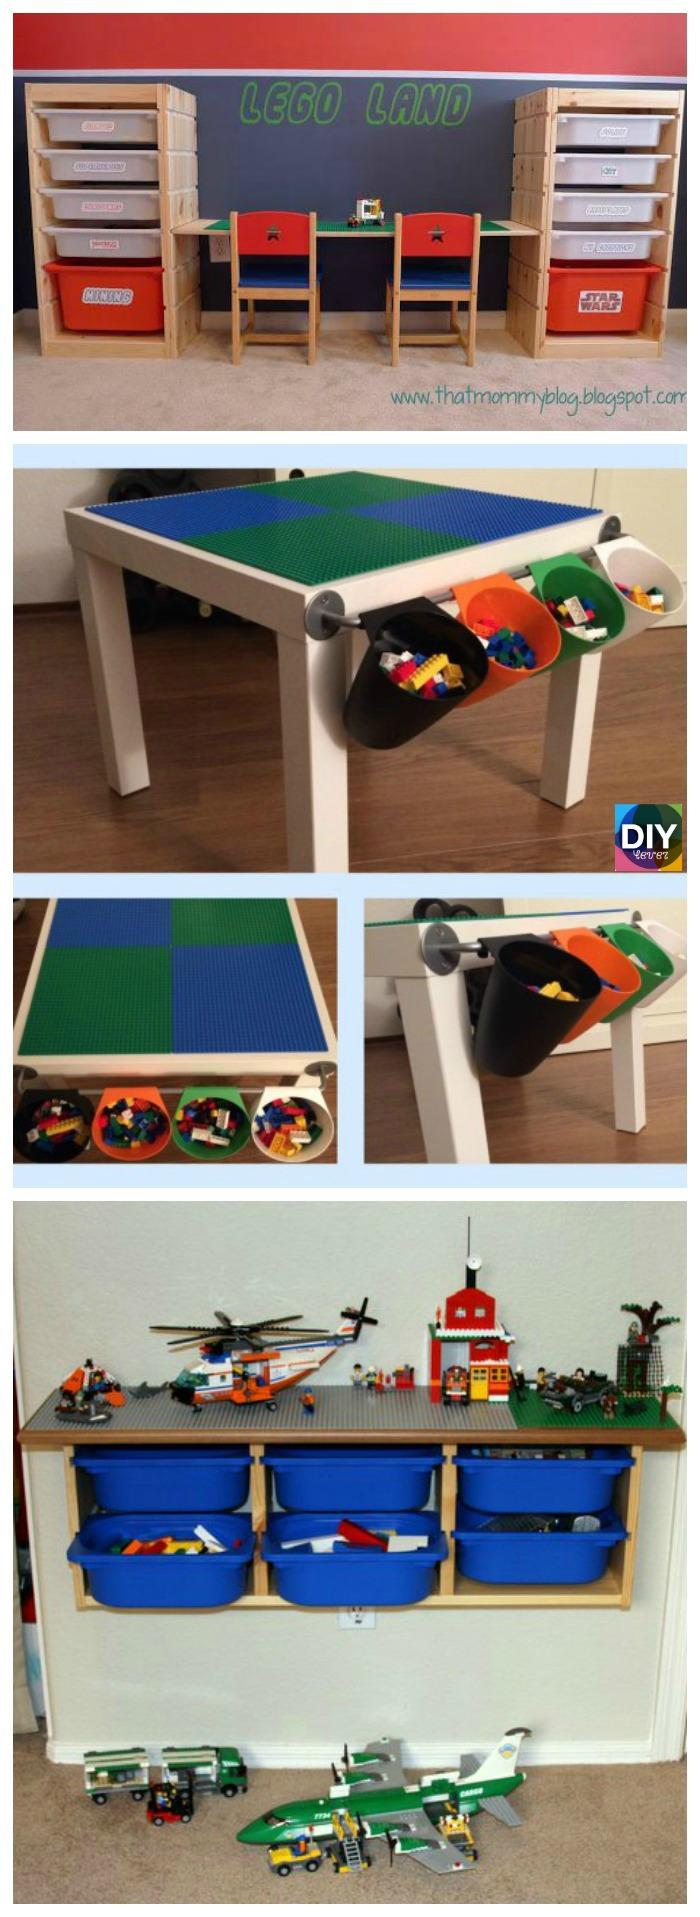 diy4ever- Creative DIY Lego Table Ideas